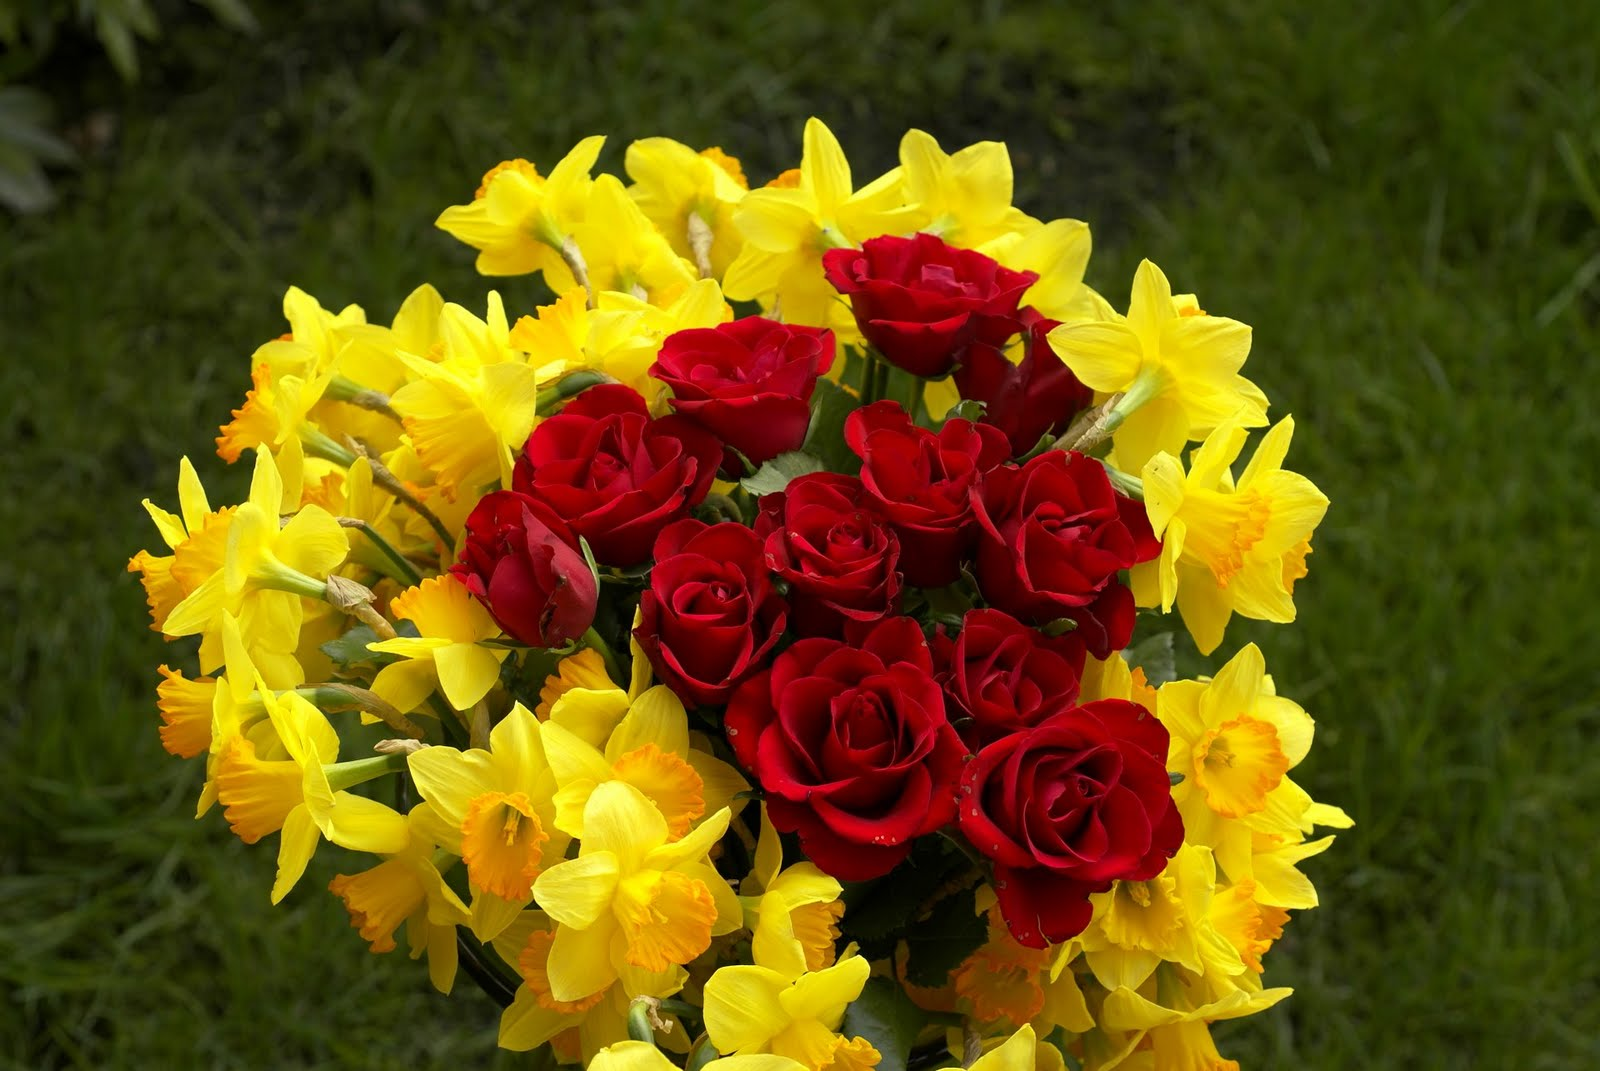 Picture Flower Rose Red Yellow 7 Wide Wallpaper Hdflowerwallpaper